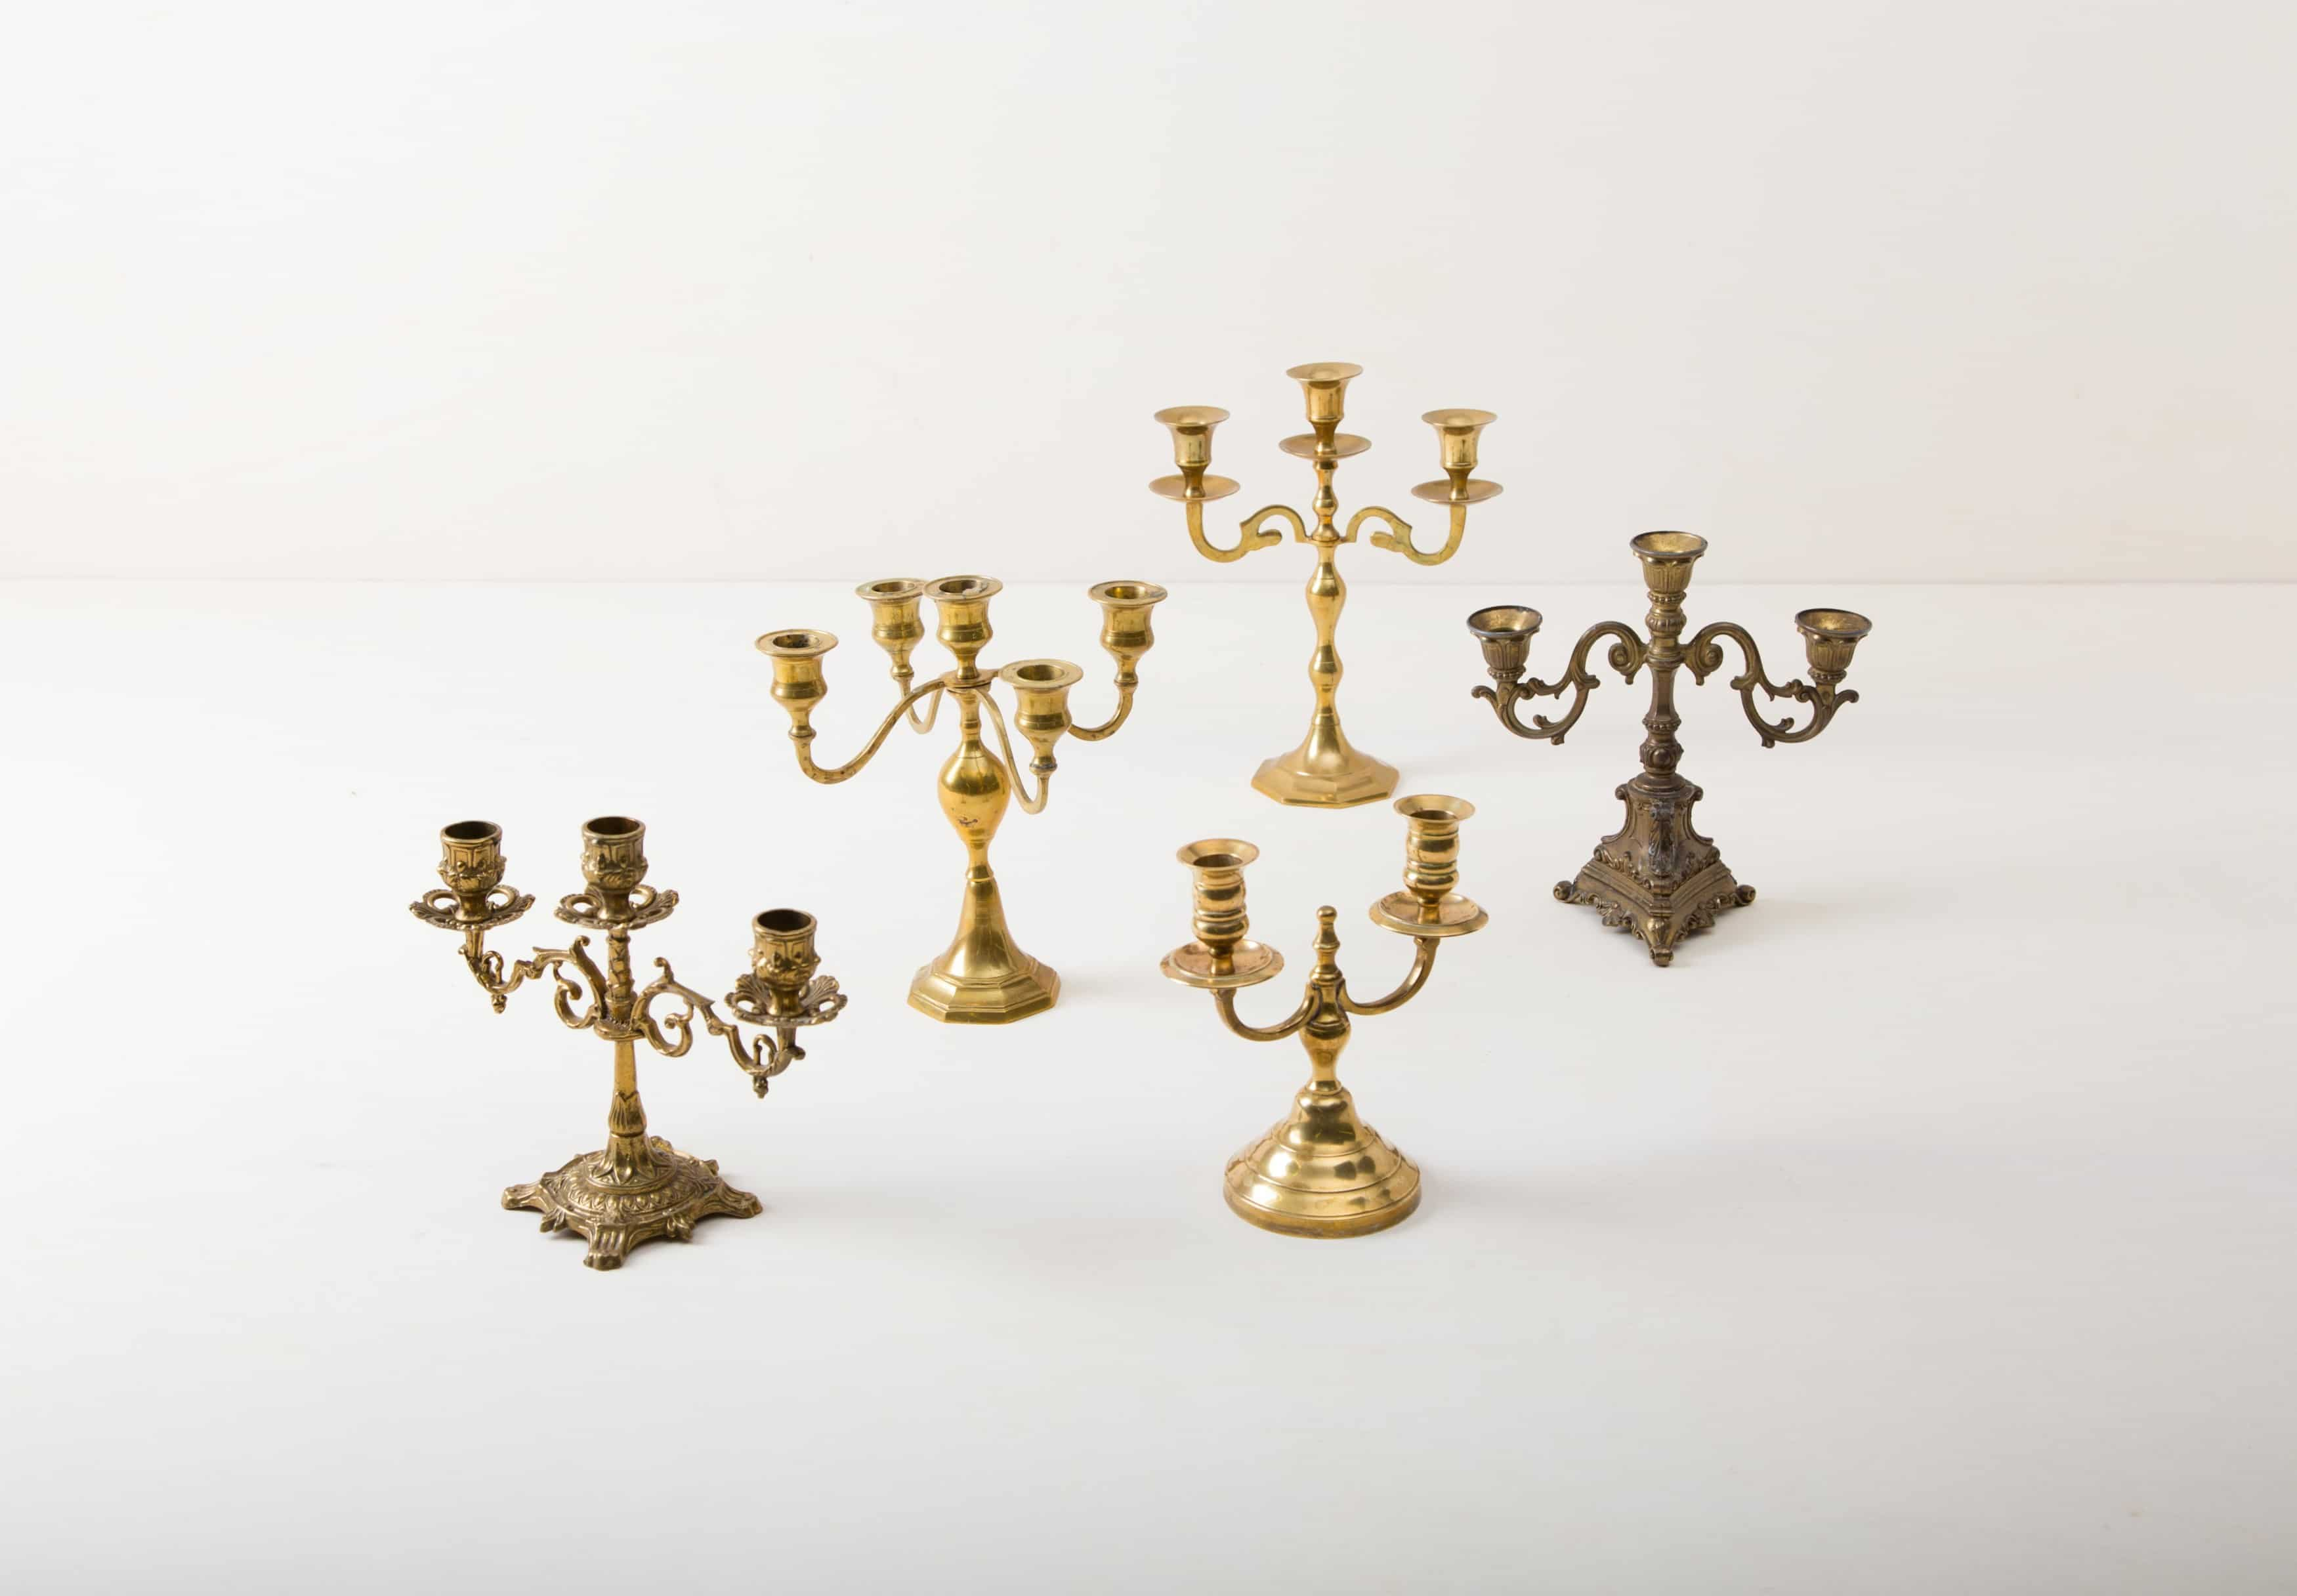 Kerzenständer, Kerzenleuchter, mieten, Hochzeit, Event